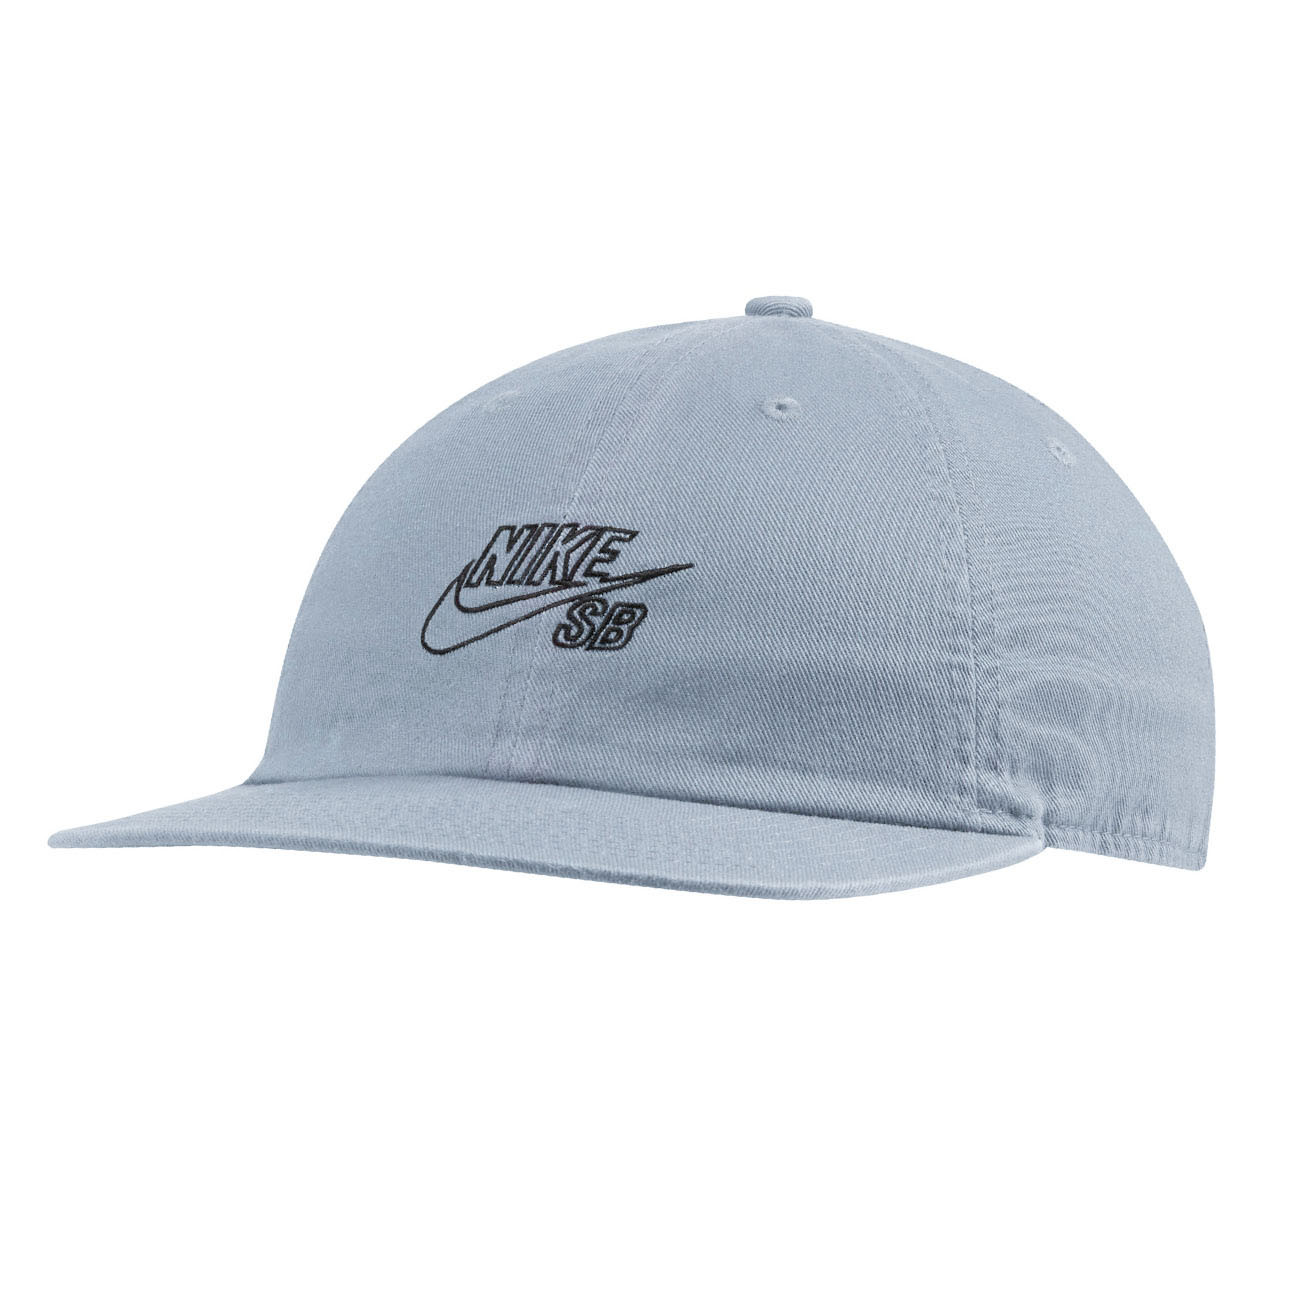 Cap Nike SB Heritage 86 Flatbill lt